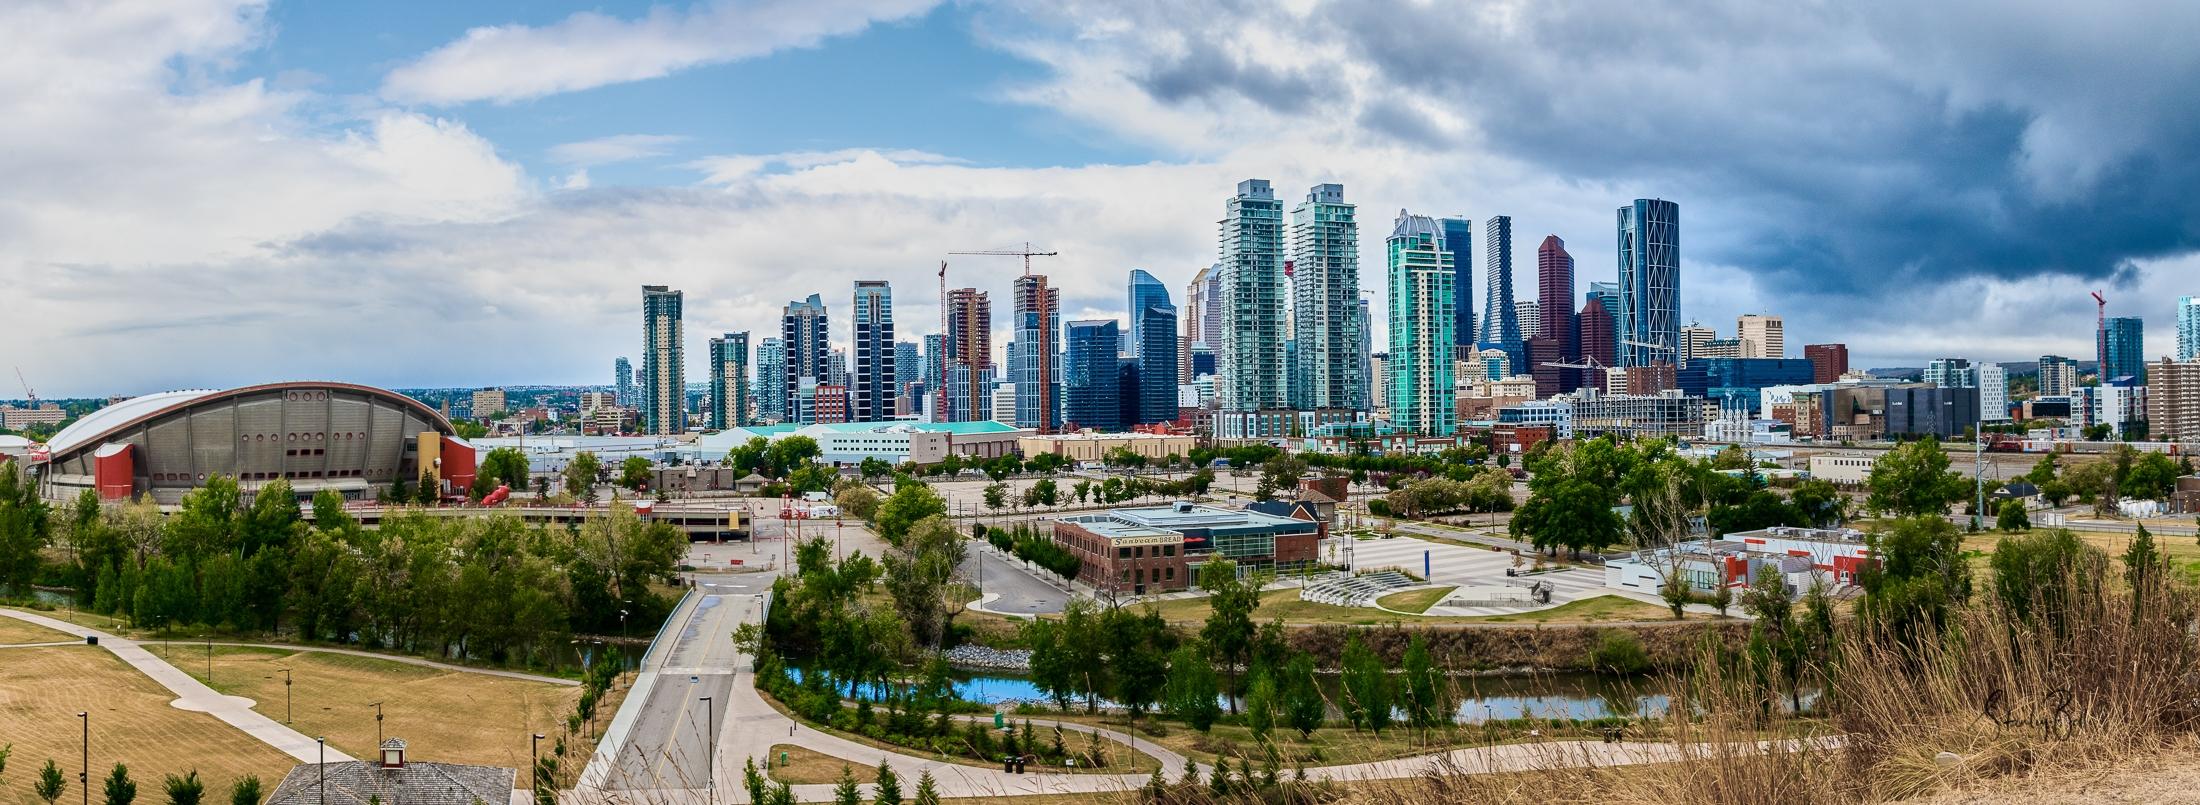 8506963-Calgary-Skyline-Pano-V2